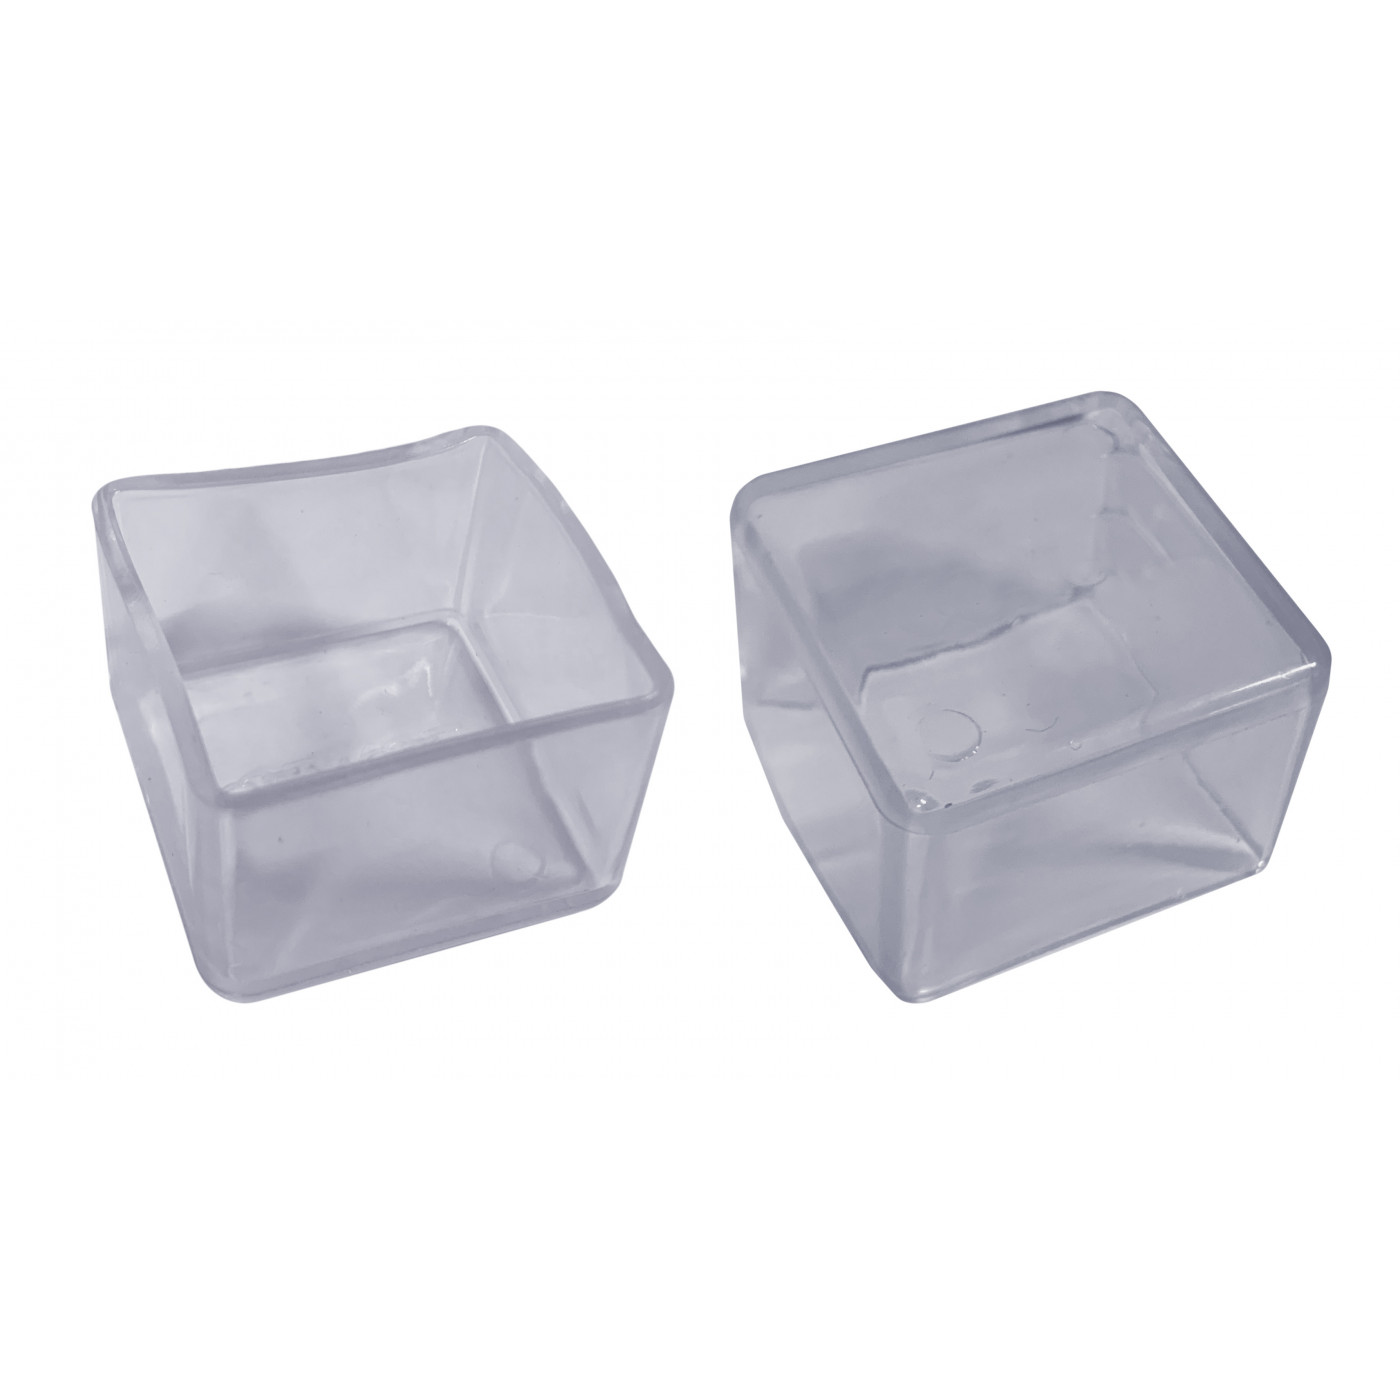 Set von 32 silikonkappen (Außenkappe, Quadrat, 25 mm